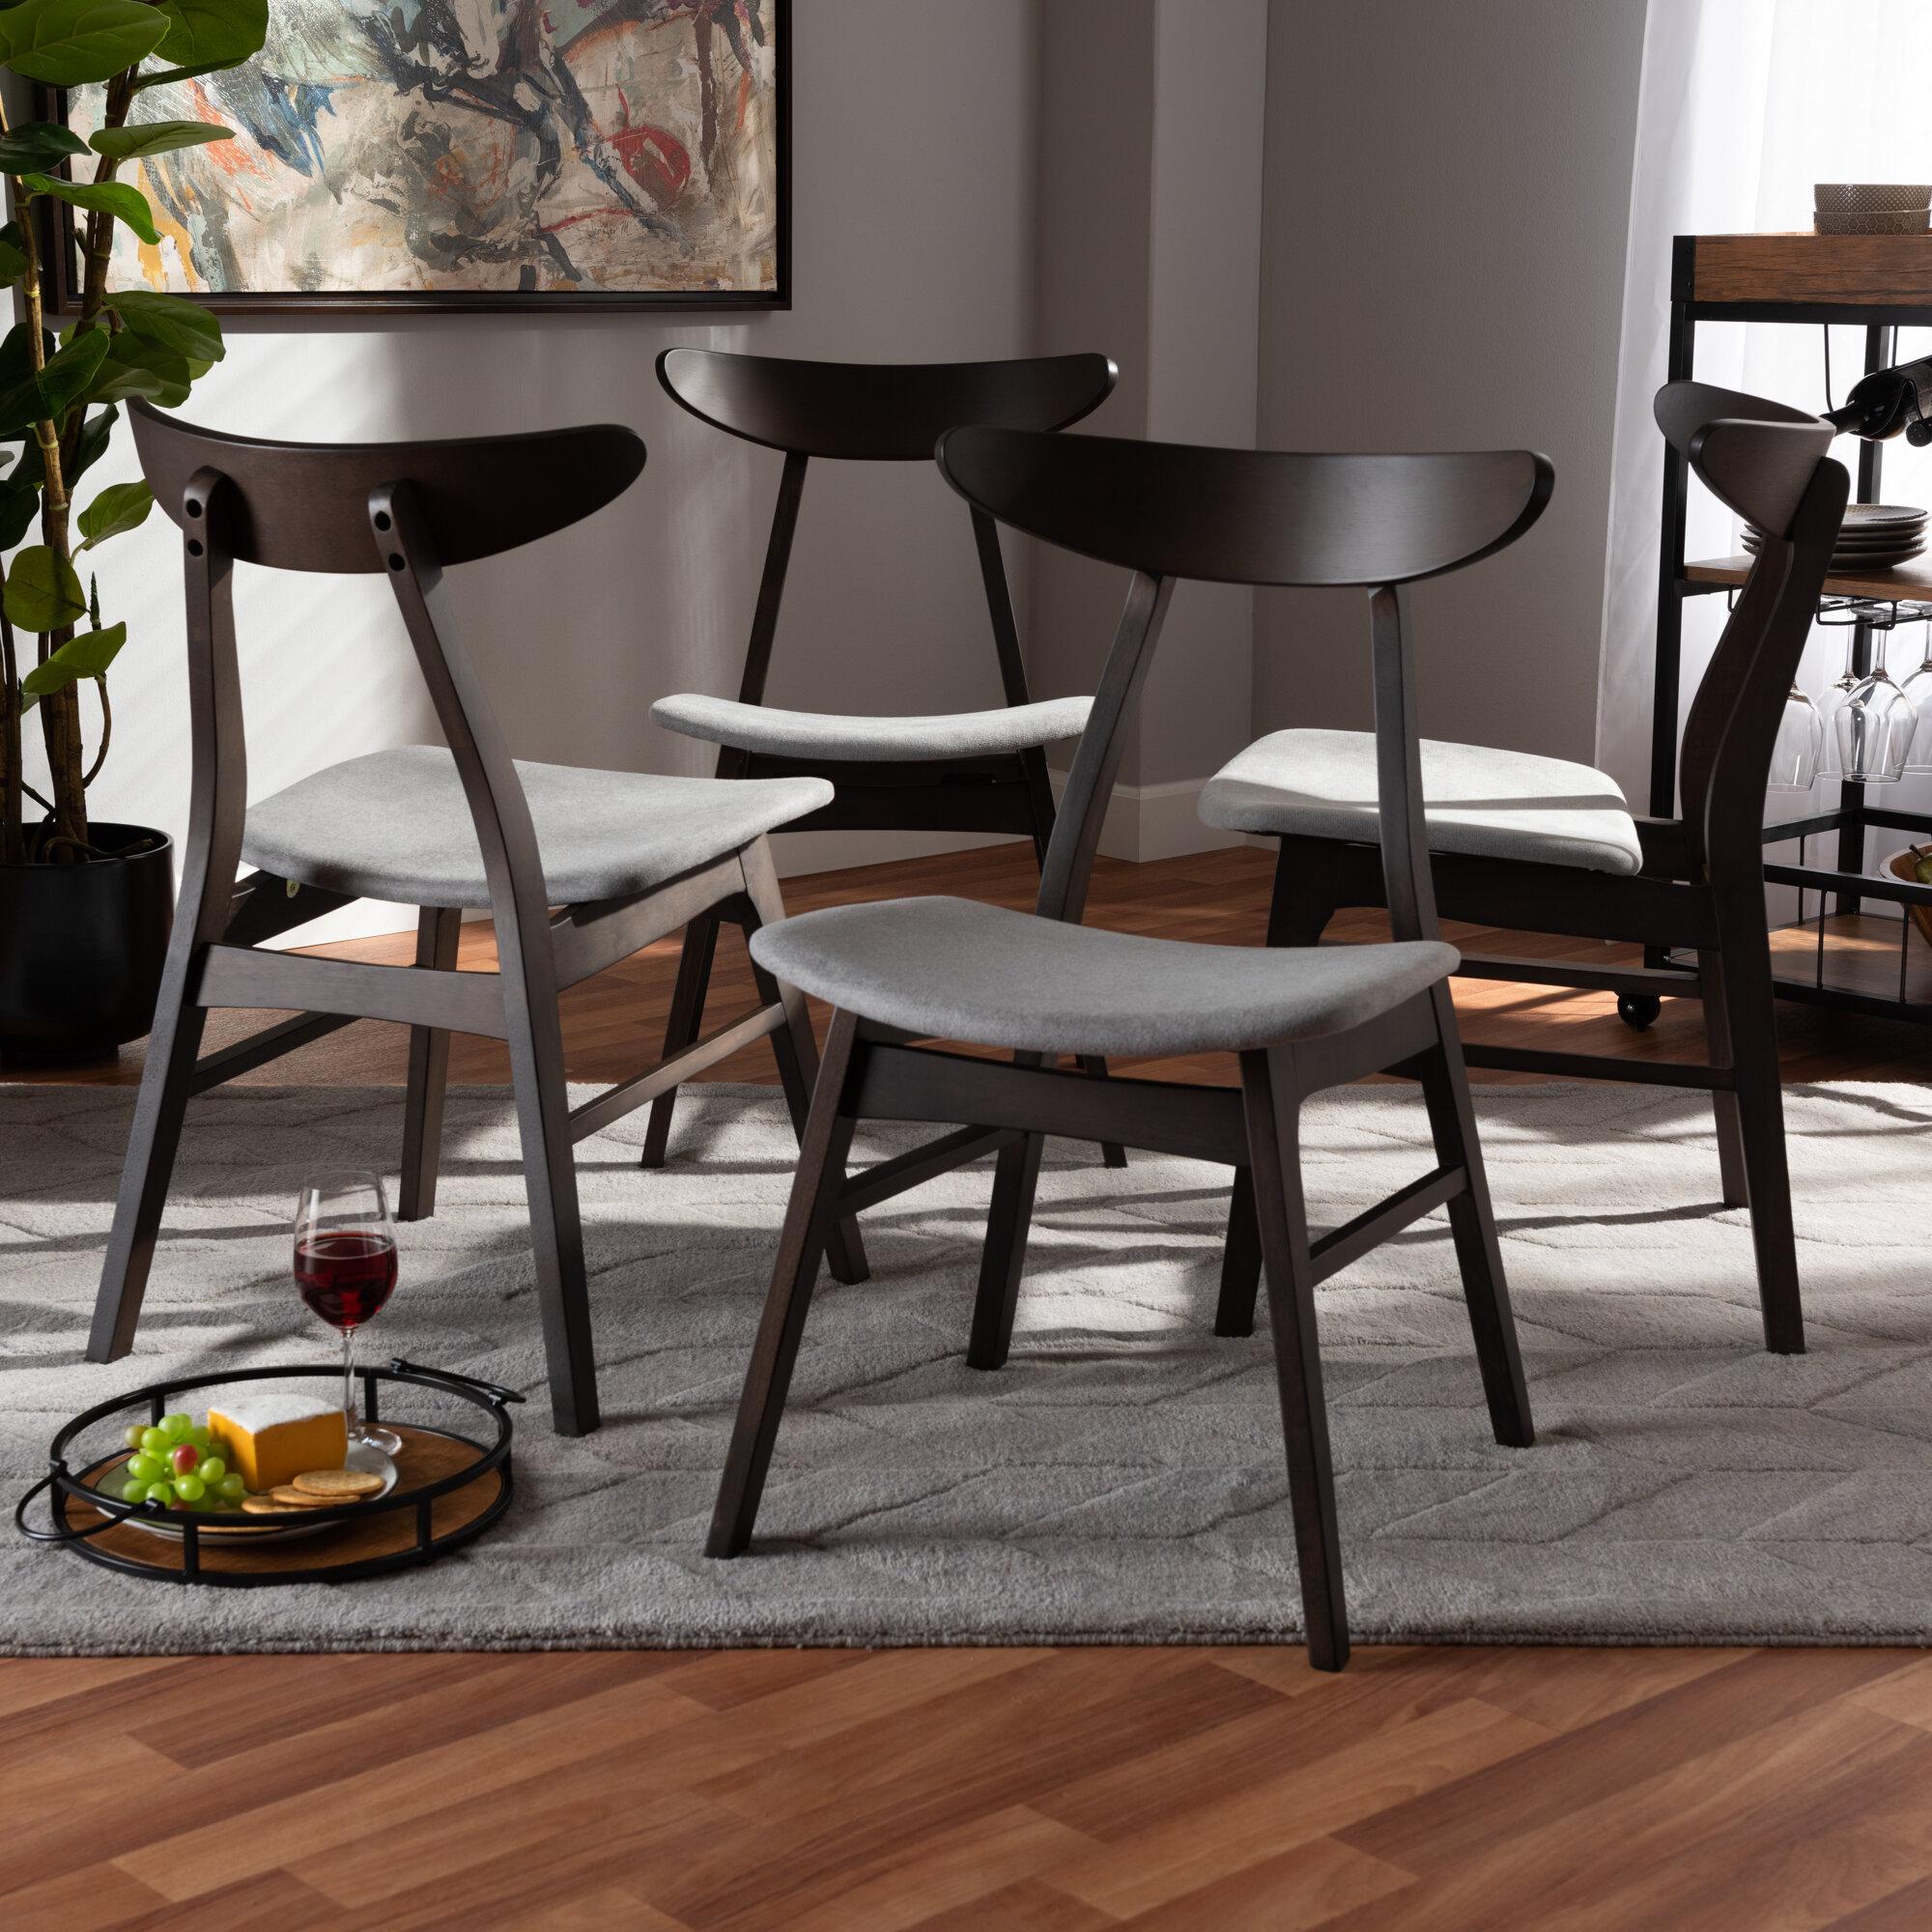 Foundry Select Tamsin Solid Wood Ladder Back Side Chair In Dark Brown Reviews Wayfair